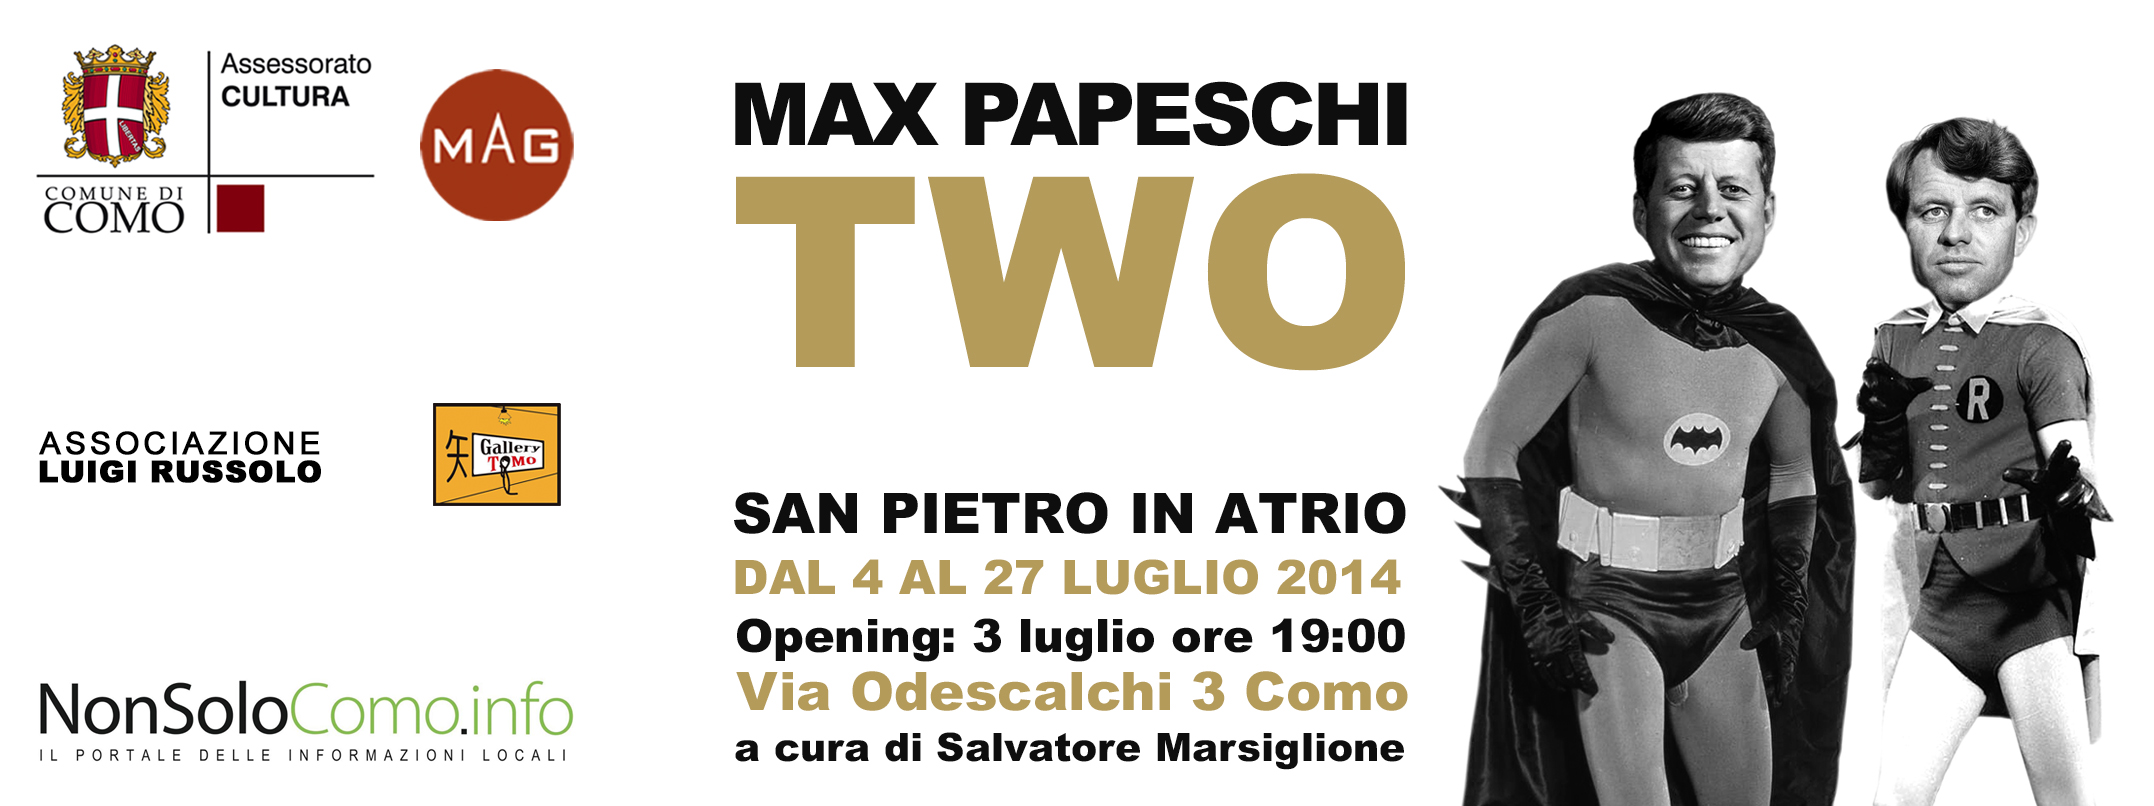 Two mostra Max Papeschi Como